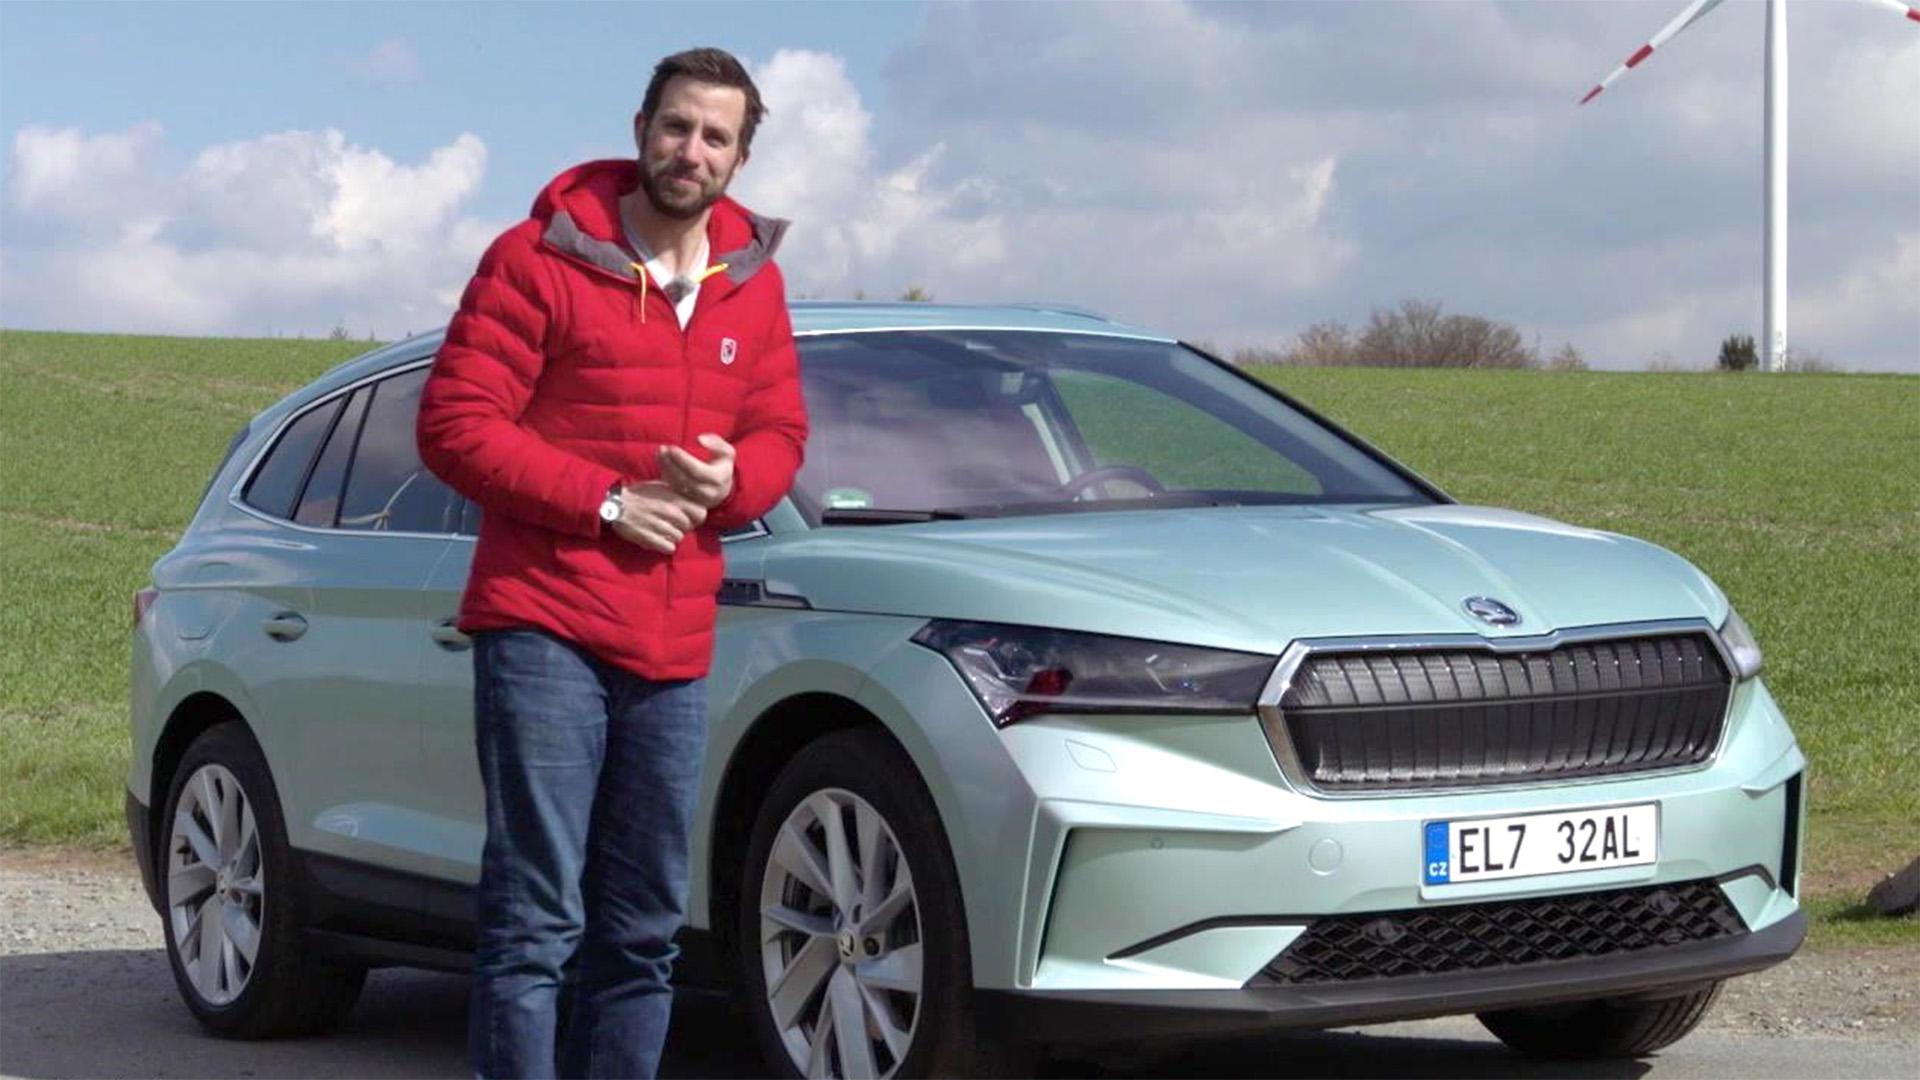 Thema u.a.: Der neue Škoda Enyaq | Folge 19